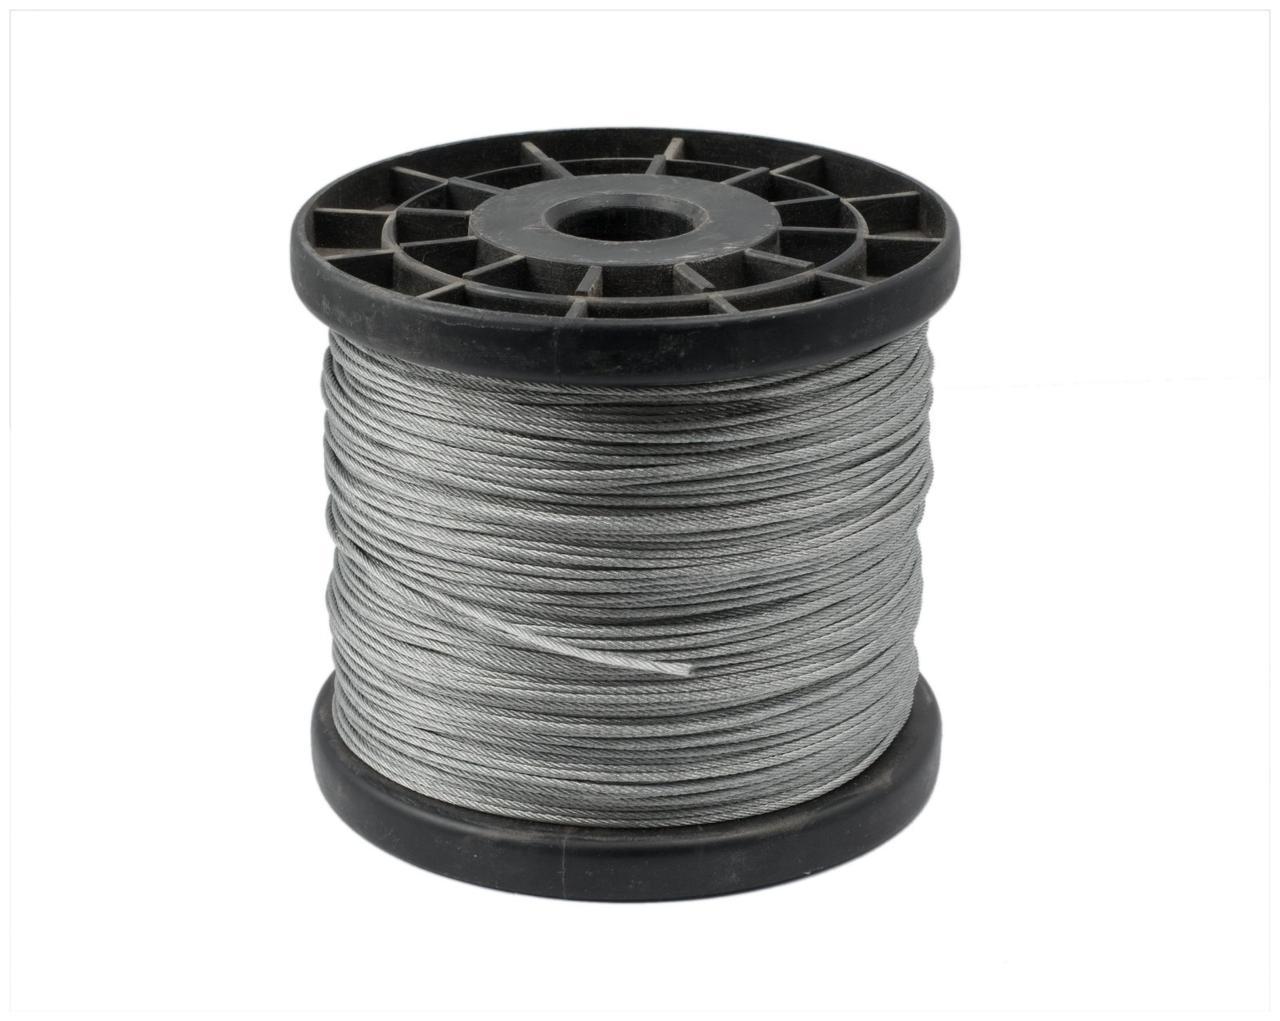 Трос стальной  MMG DIN 3053 1 х 19  1 мм (Цинк)  1 метр